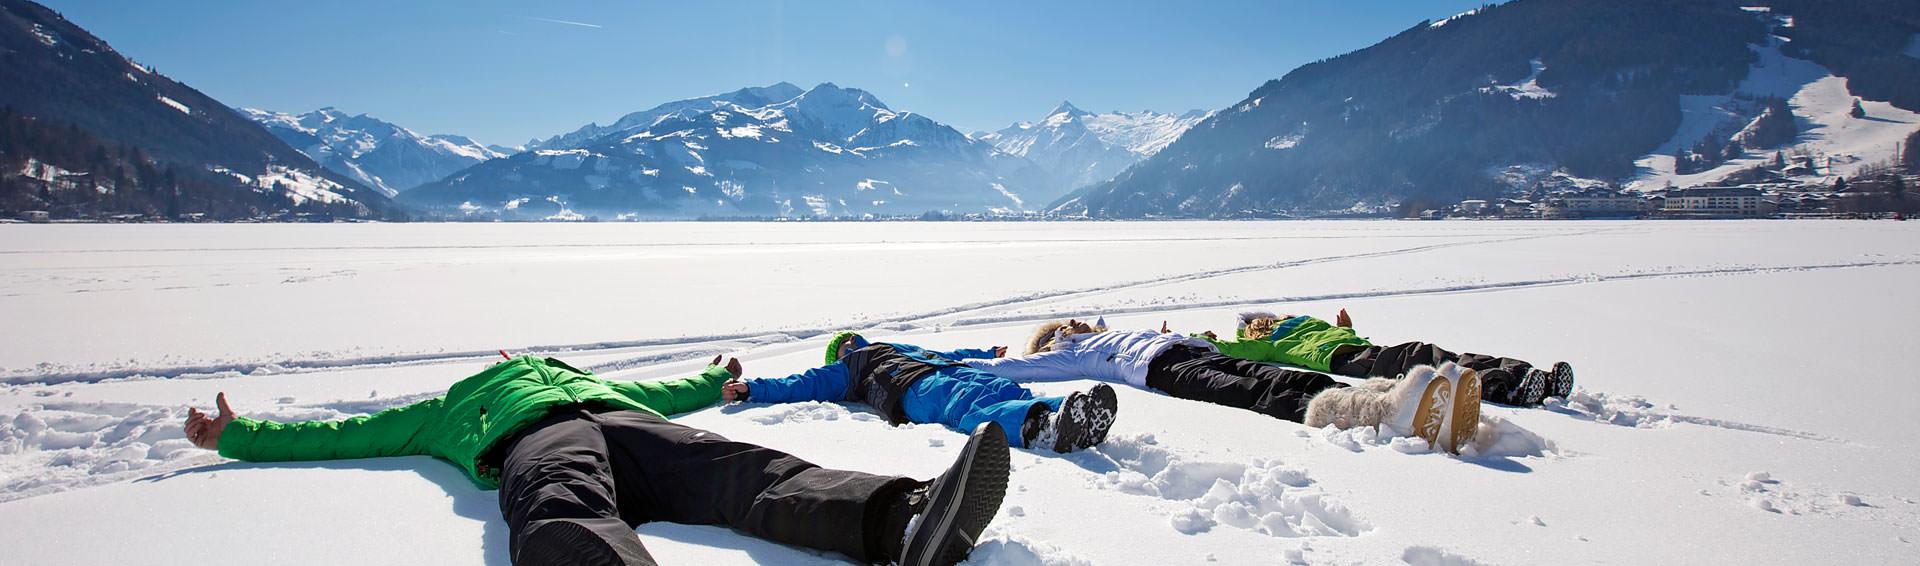 Familie liegt im Schnee bei perfektem Wetter